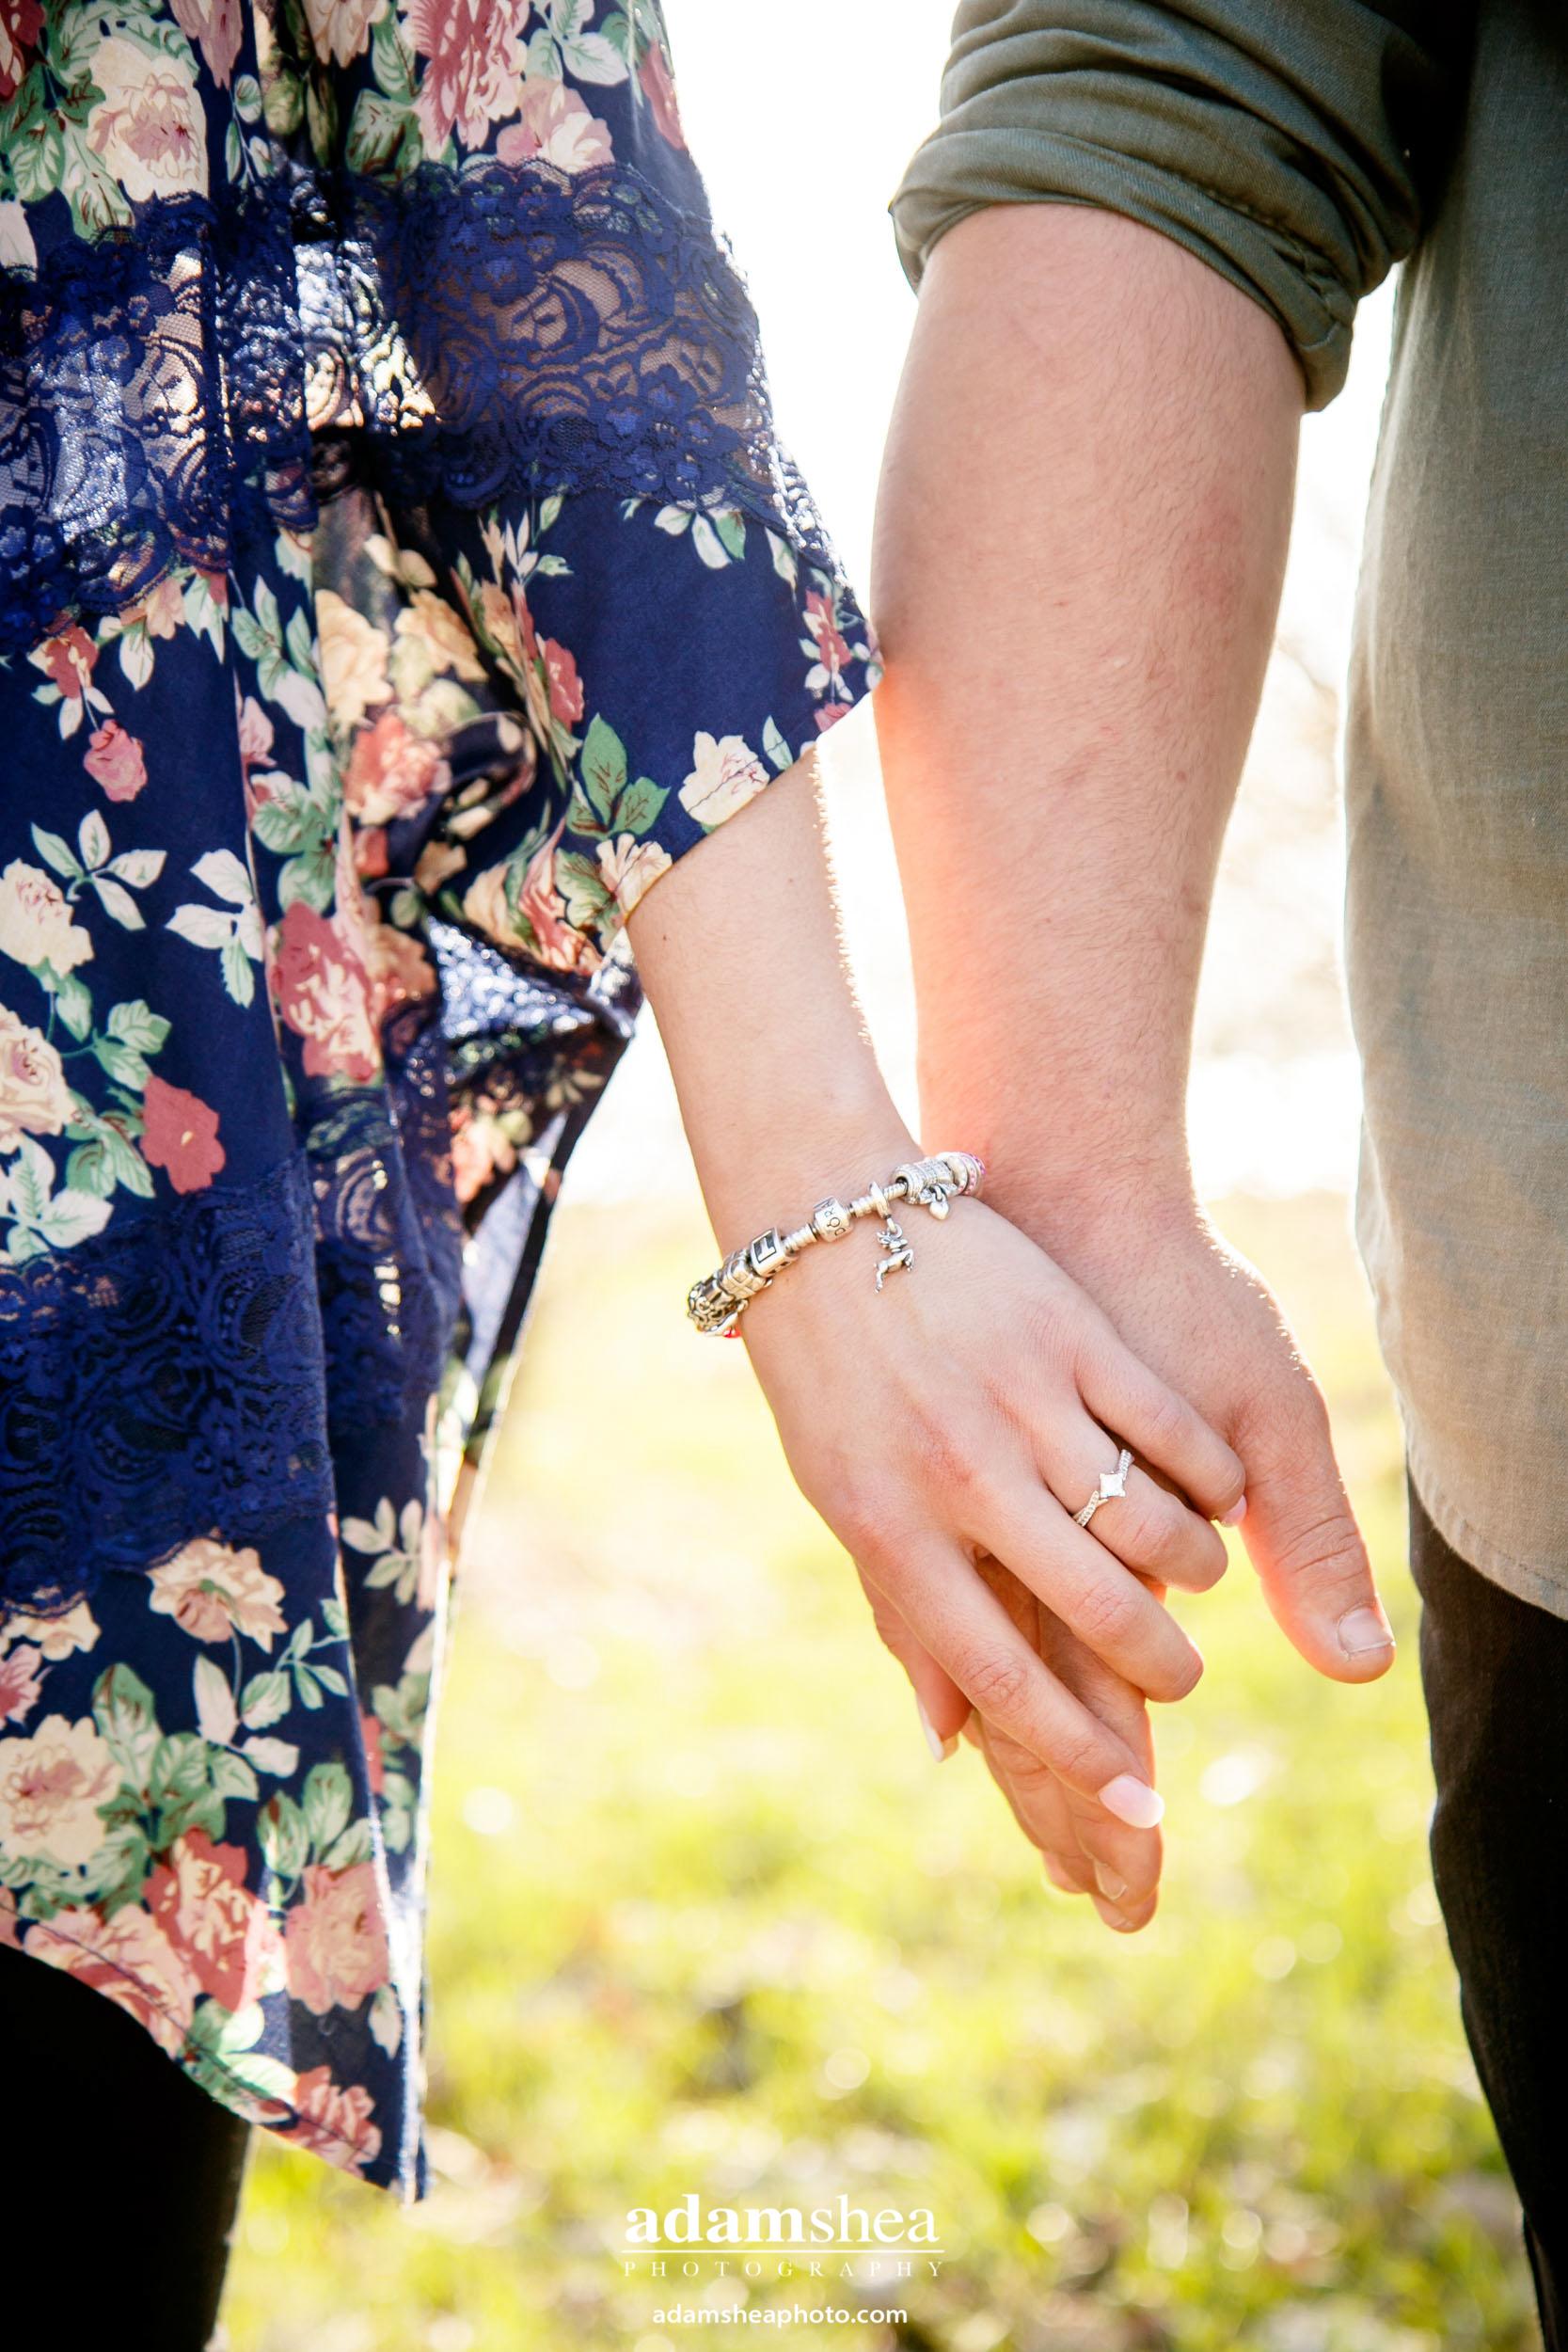 fall-engagement-photos-clothes-to-wear-adam-shea-photography-green-bay-appleton-neenah-photographer-16-2.jpg